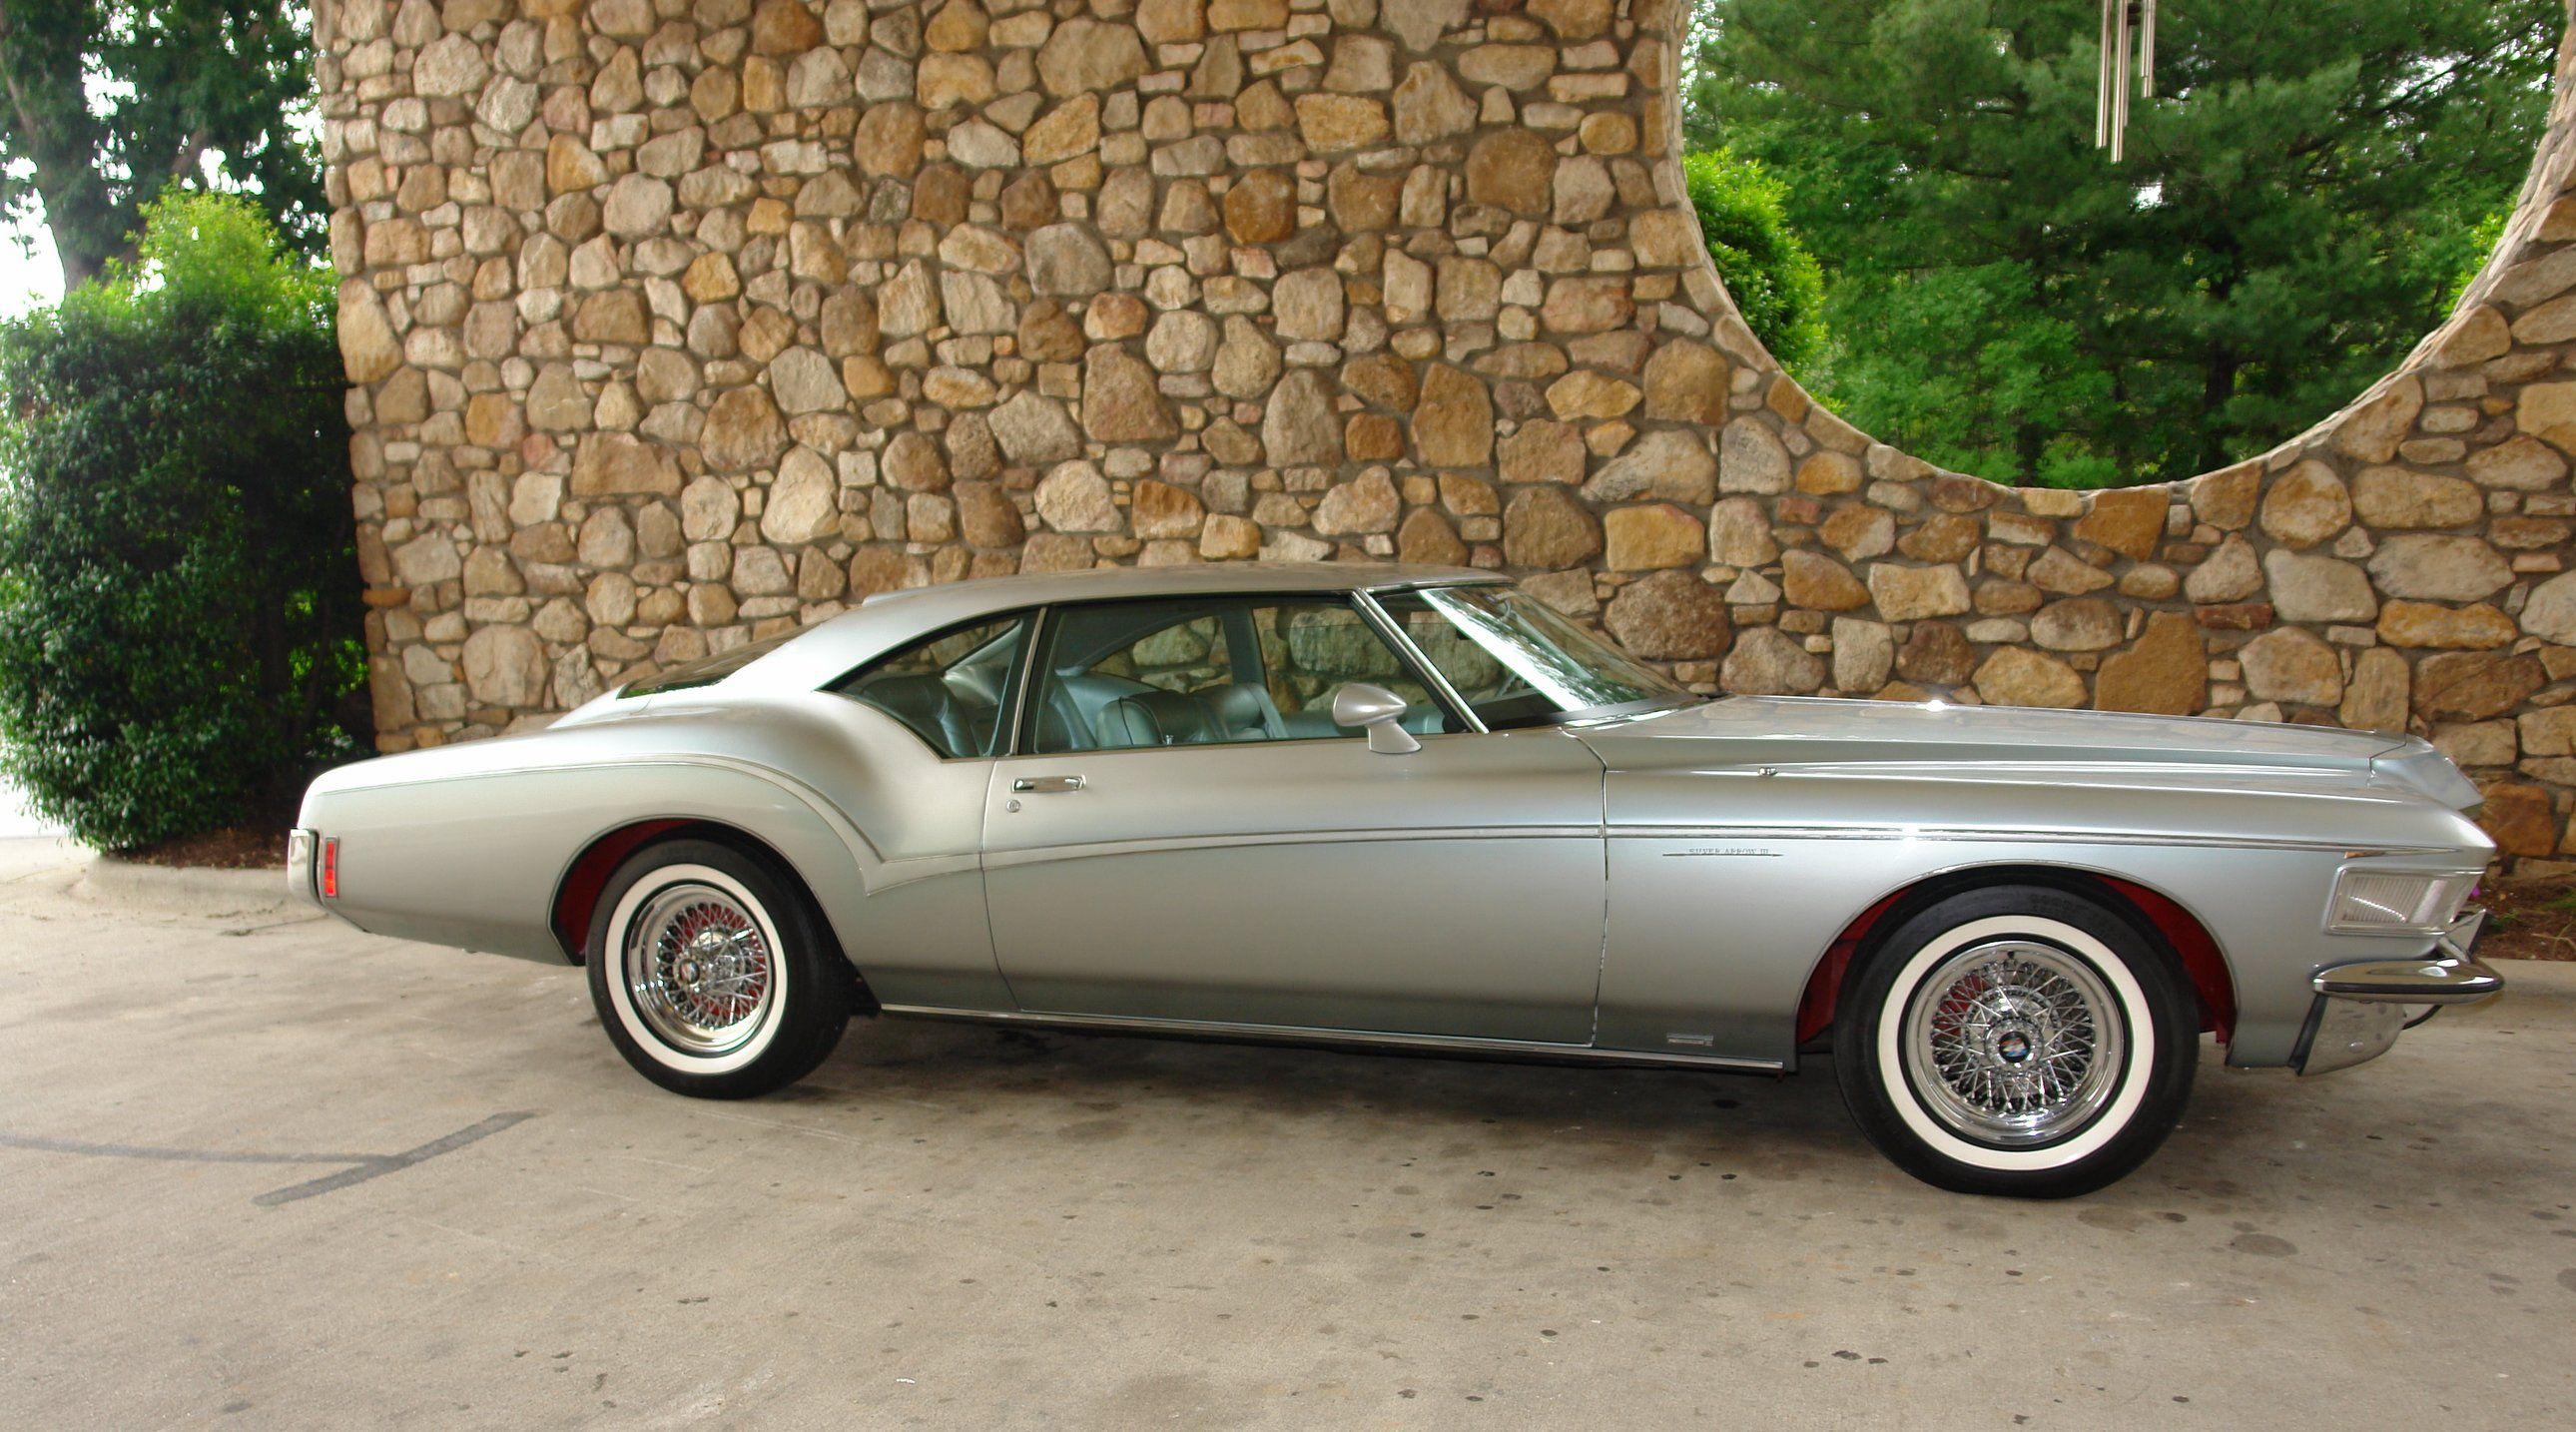 Buick Riviera Silver Arrow show car pinstriping whitewalls and